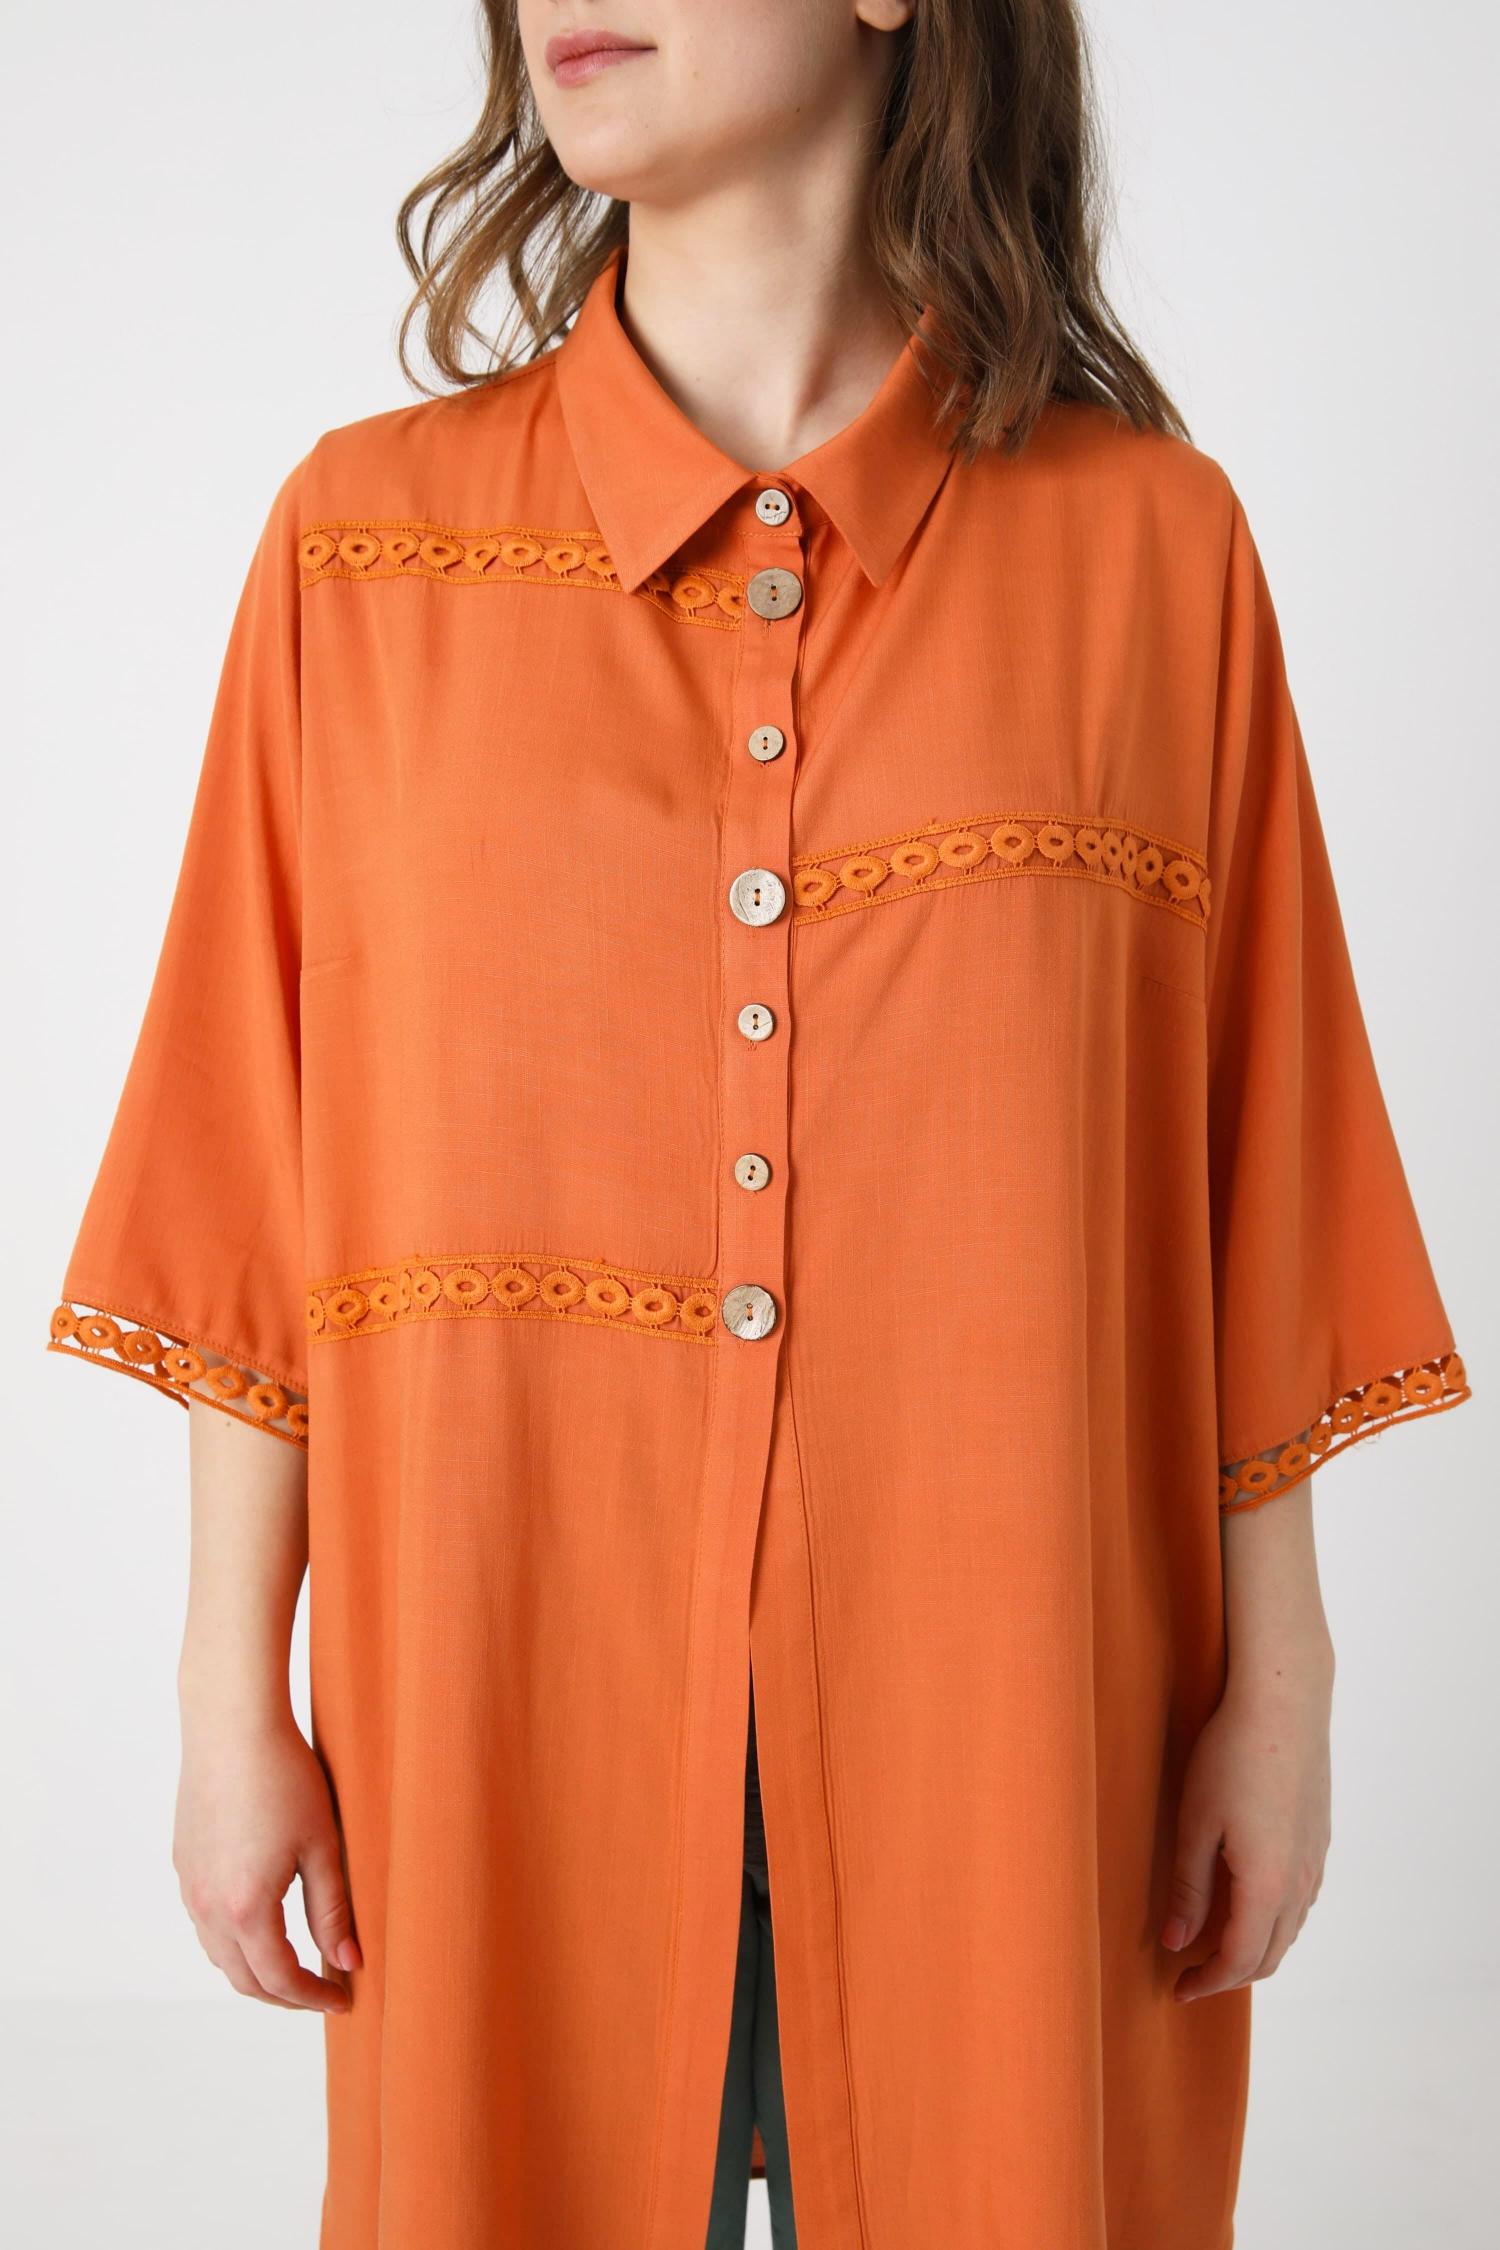 Long plain shirt with braid (Shipping 25/31 March).